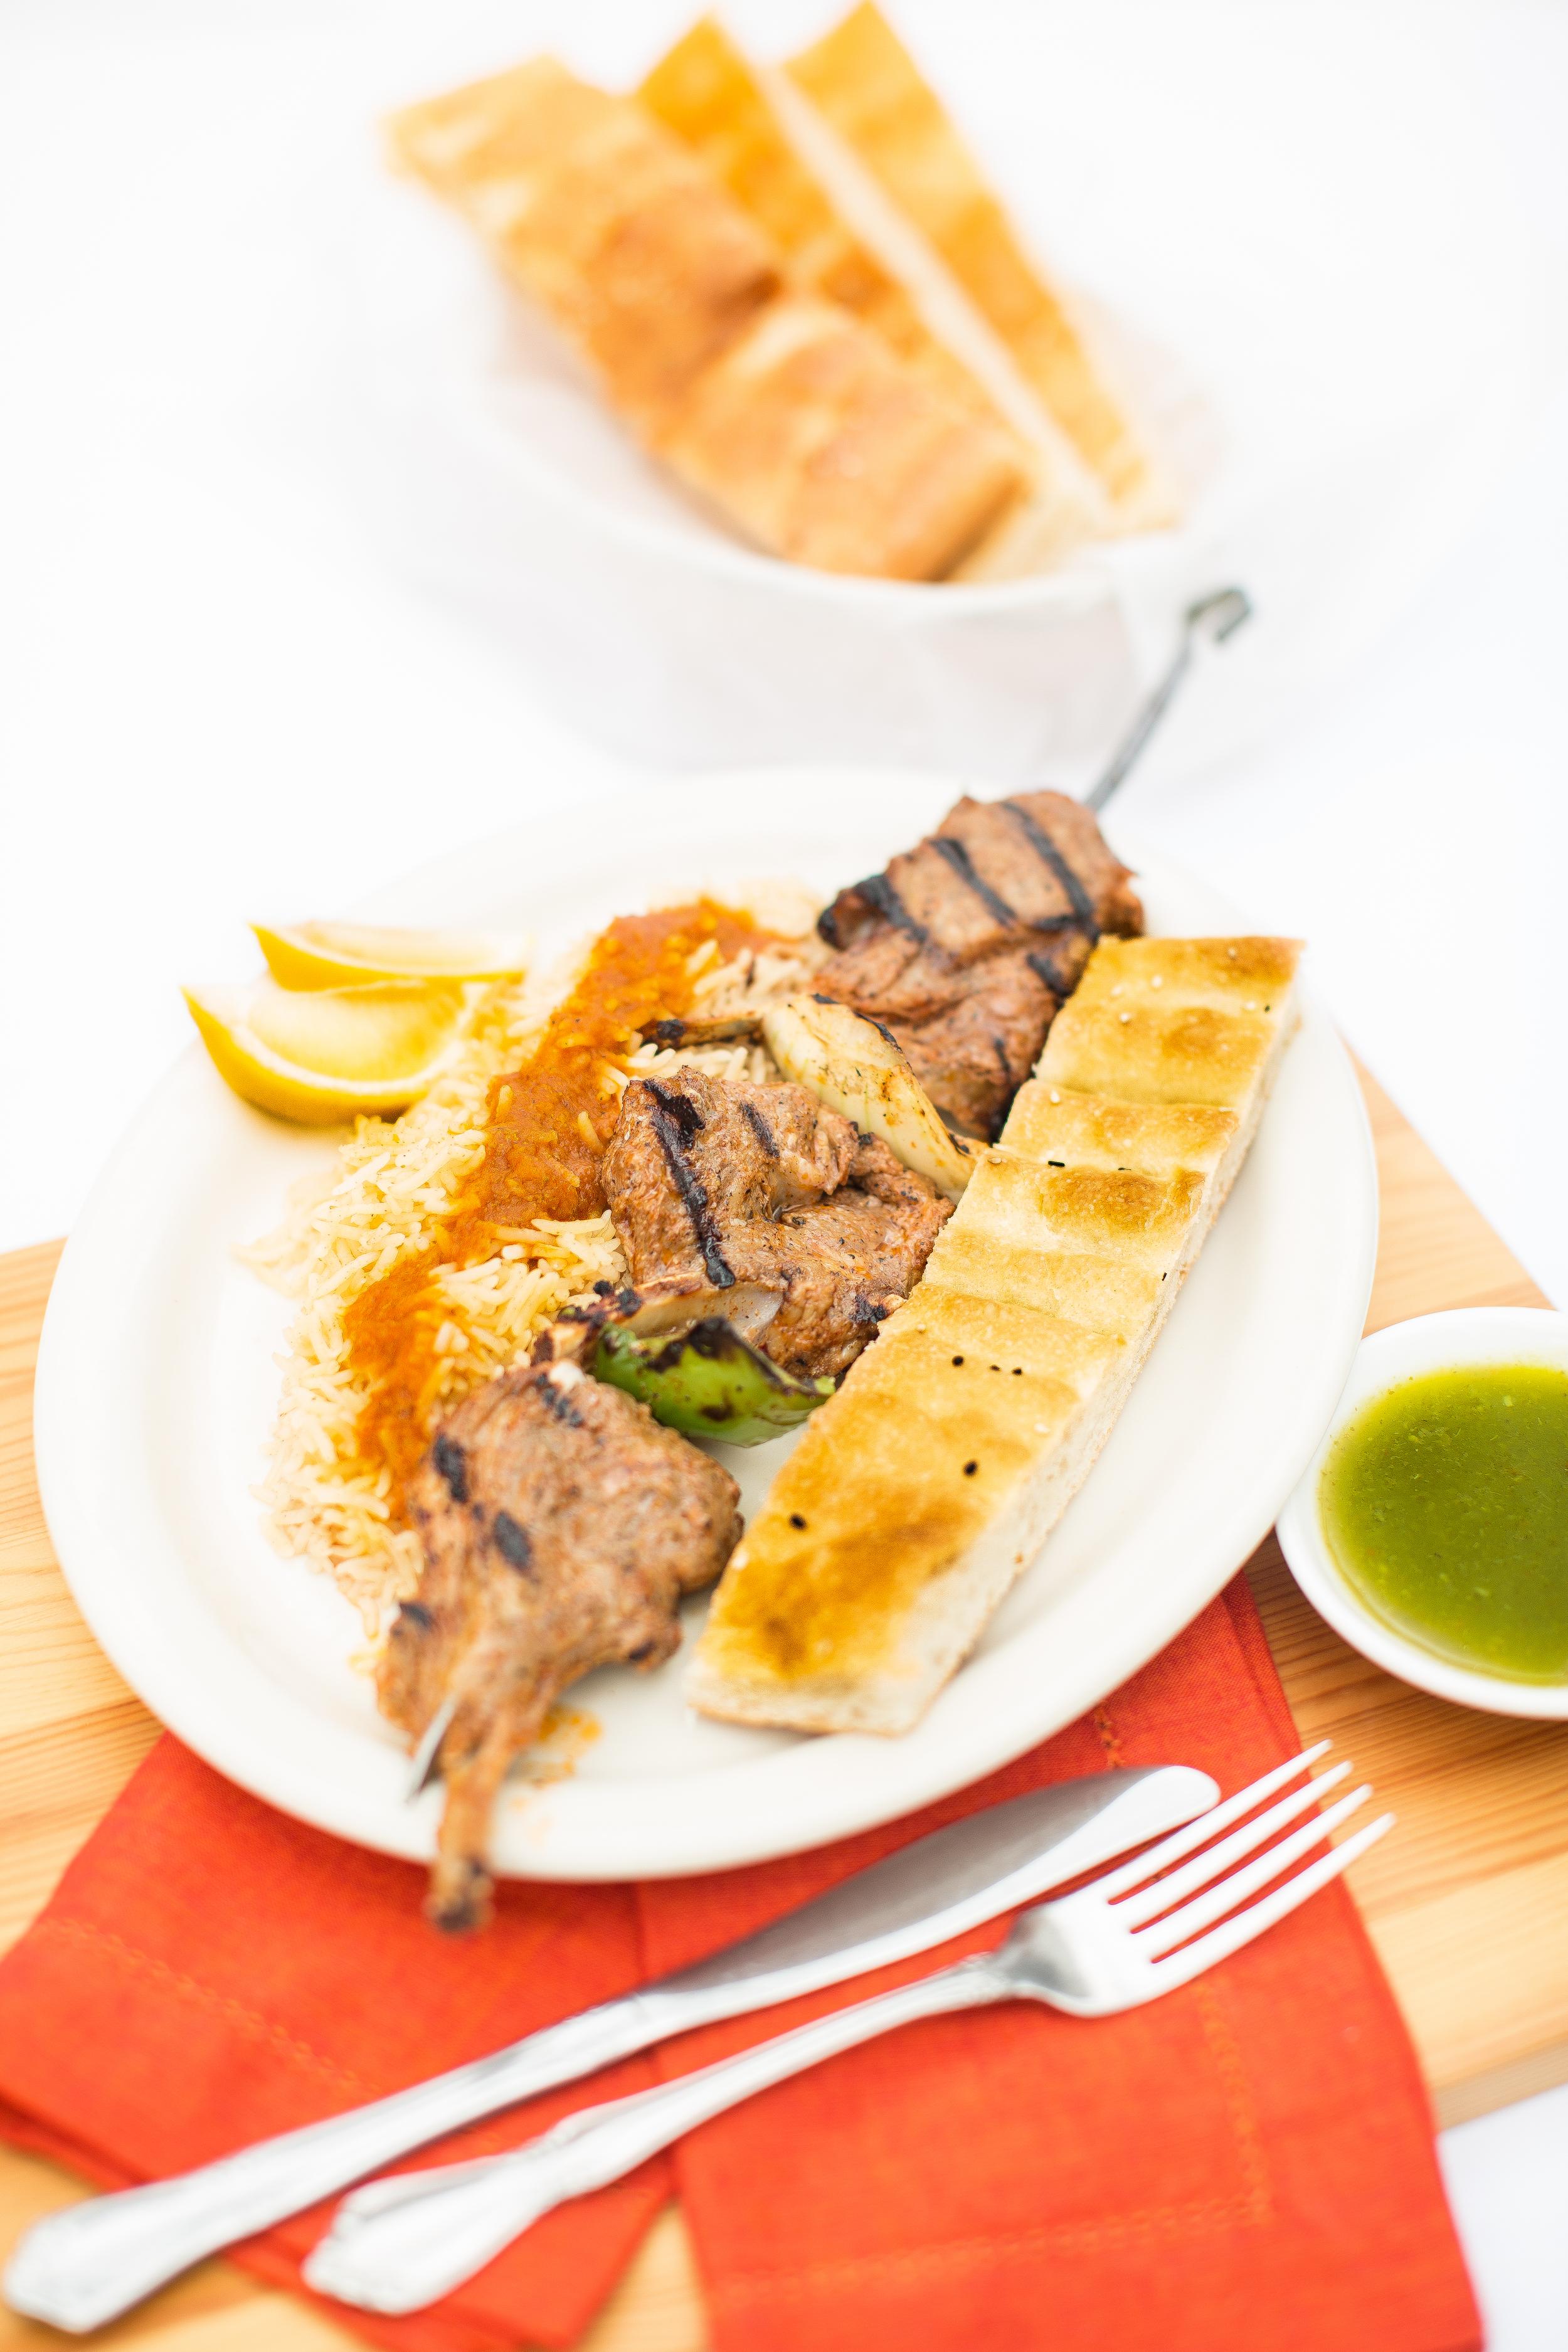 Panjshir-Cam-2-vertical-6-nabu-food-photography.jpg